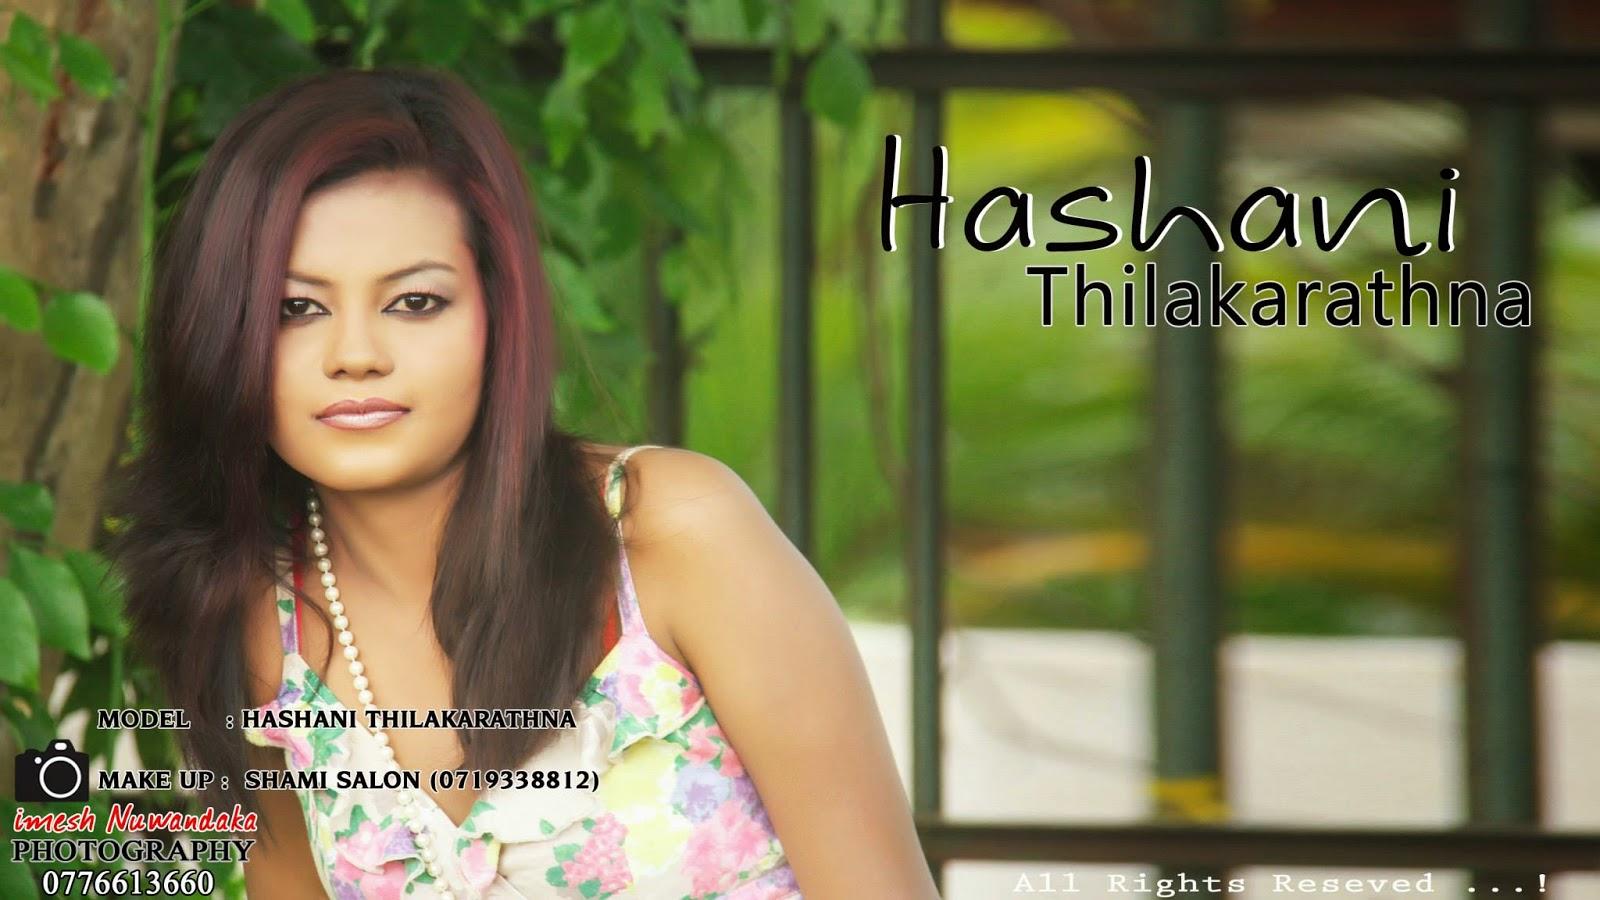 Hashani Thilakarathna